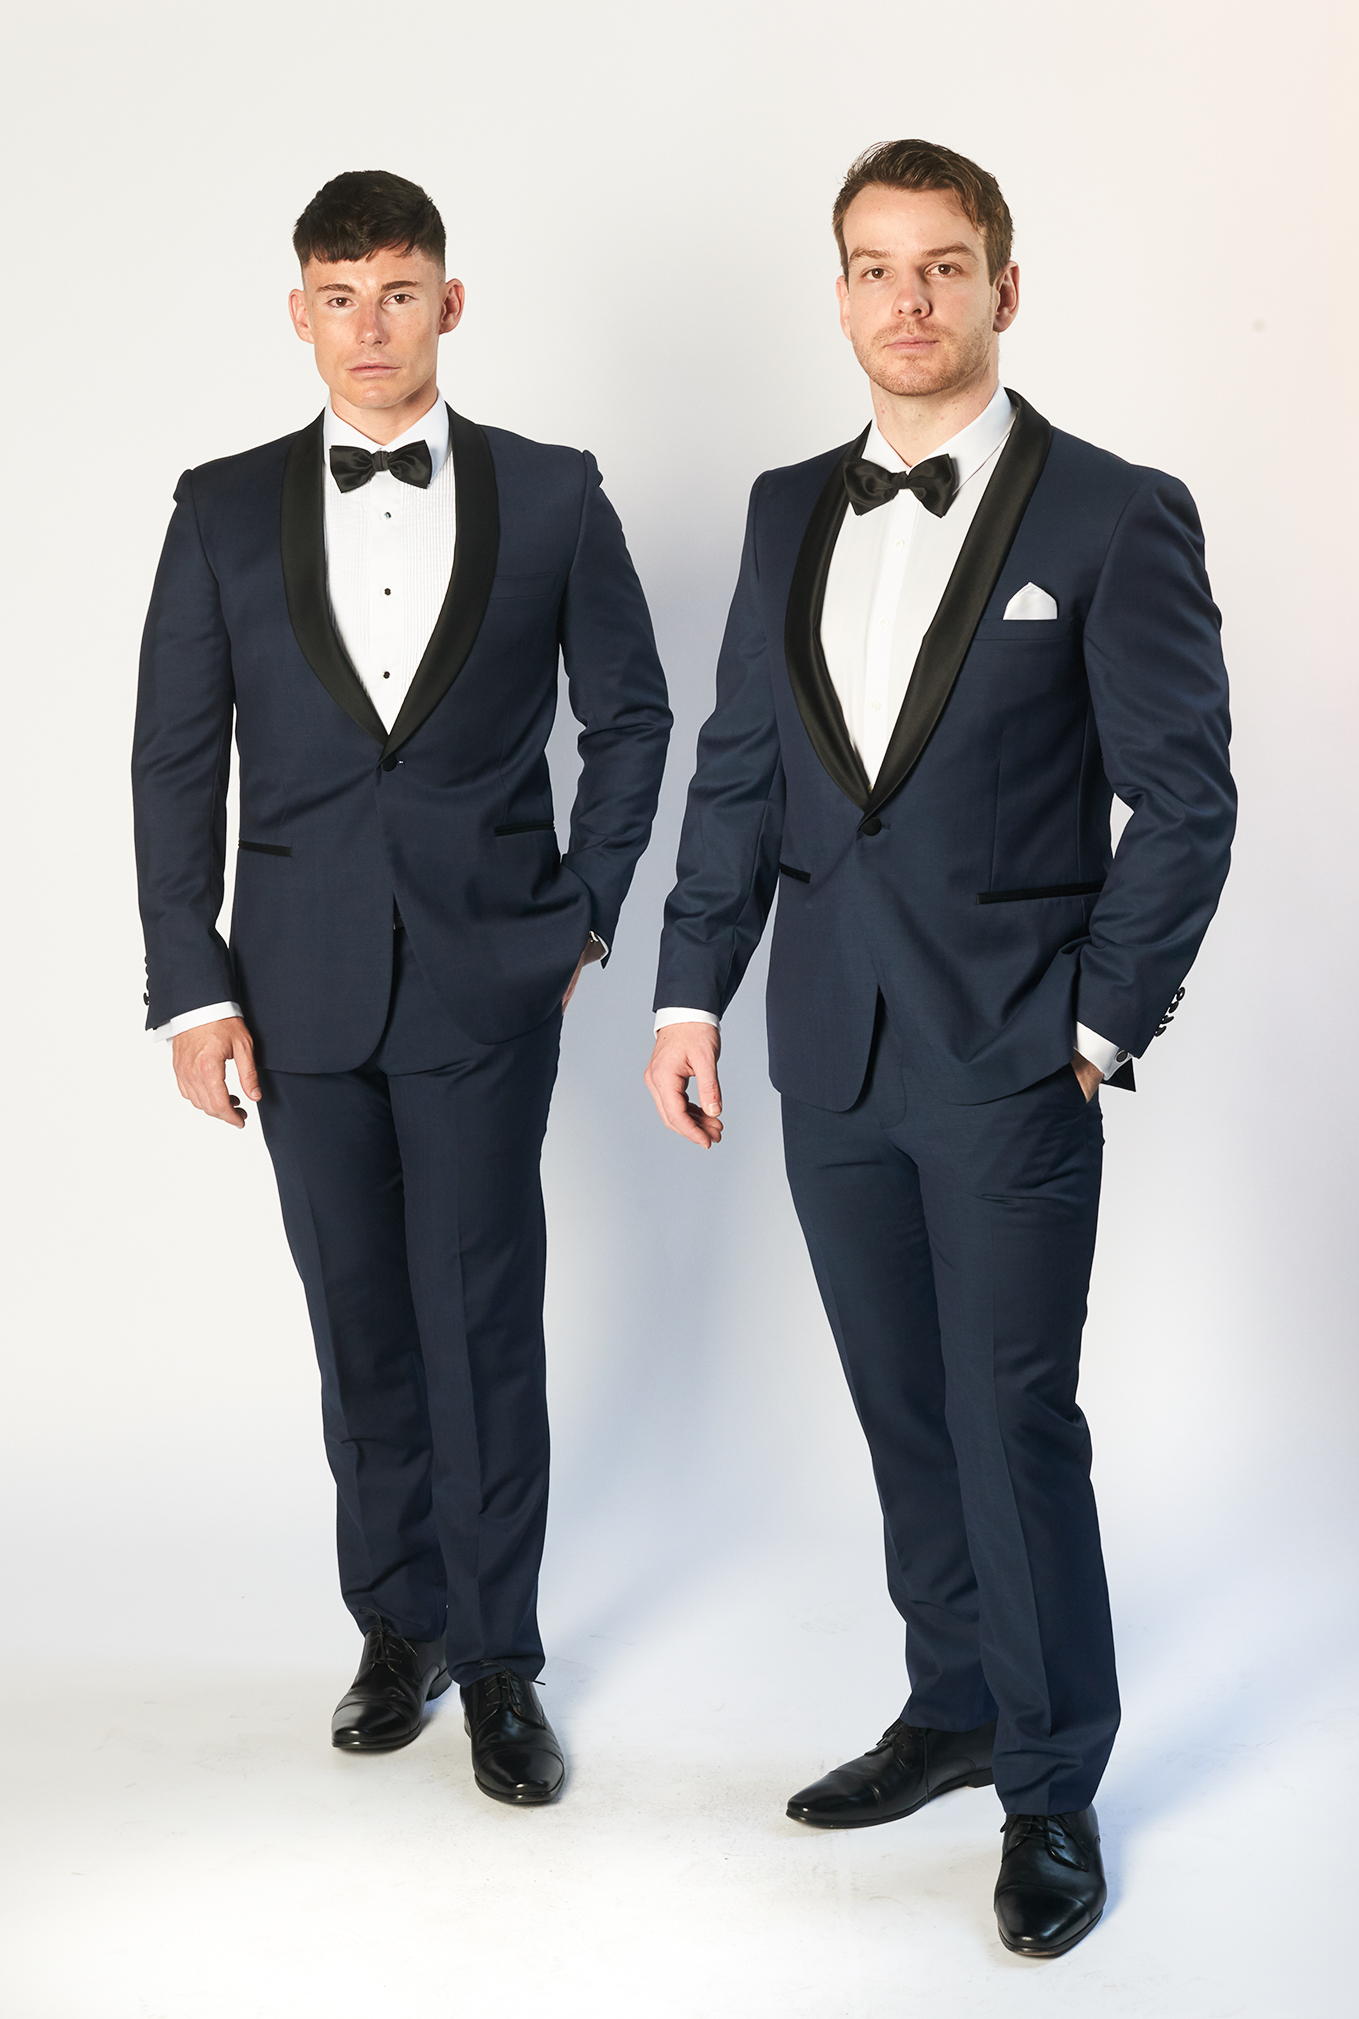 The Bond tuxedo